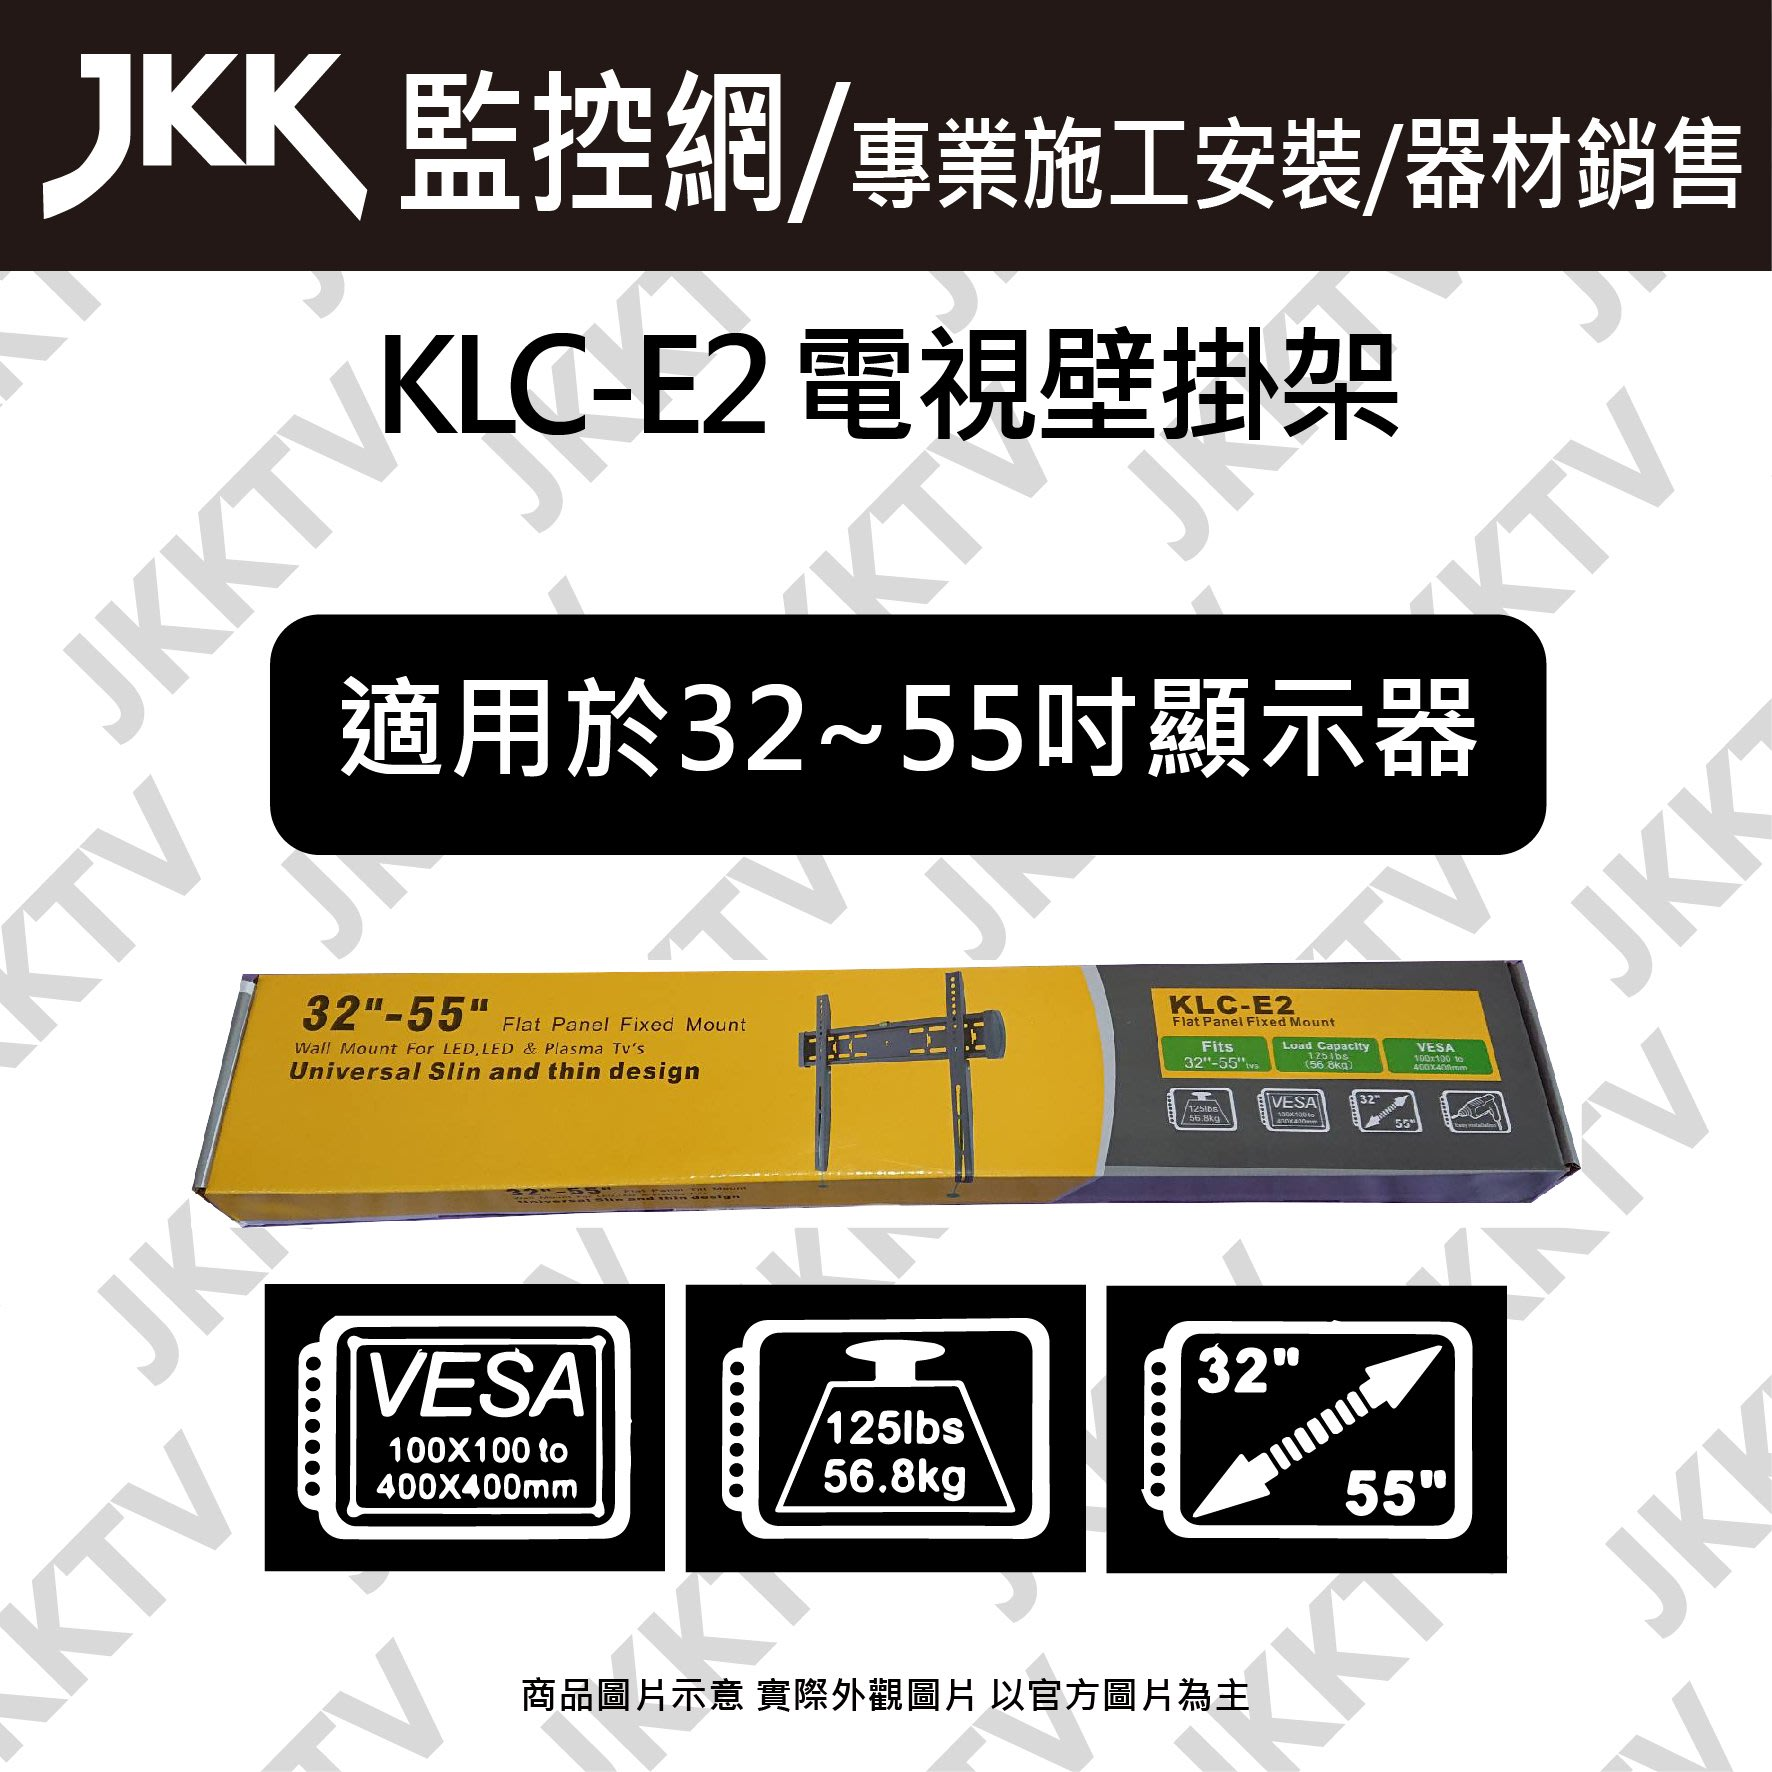 【JKKtv】KLC-E2 電視壁掛架 萬用壁掛架 適用32~55吋電視 BENQ 飛利浦 奇美 LG 三星 SONY